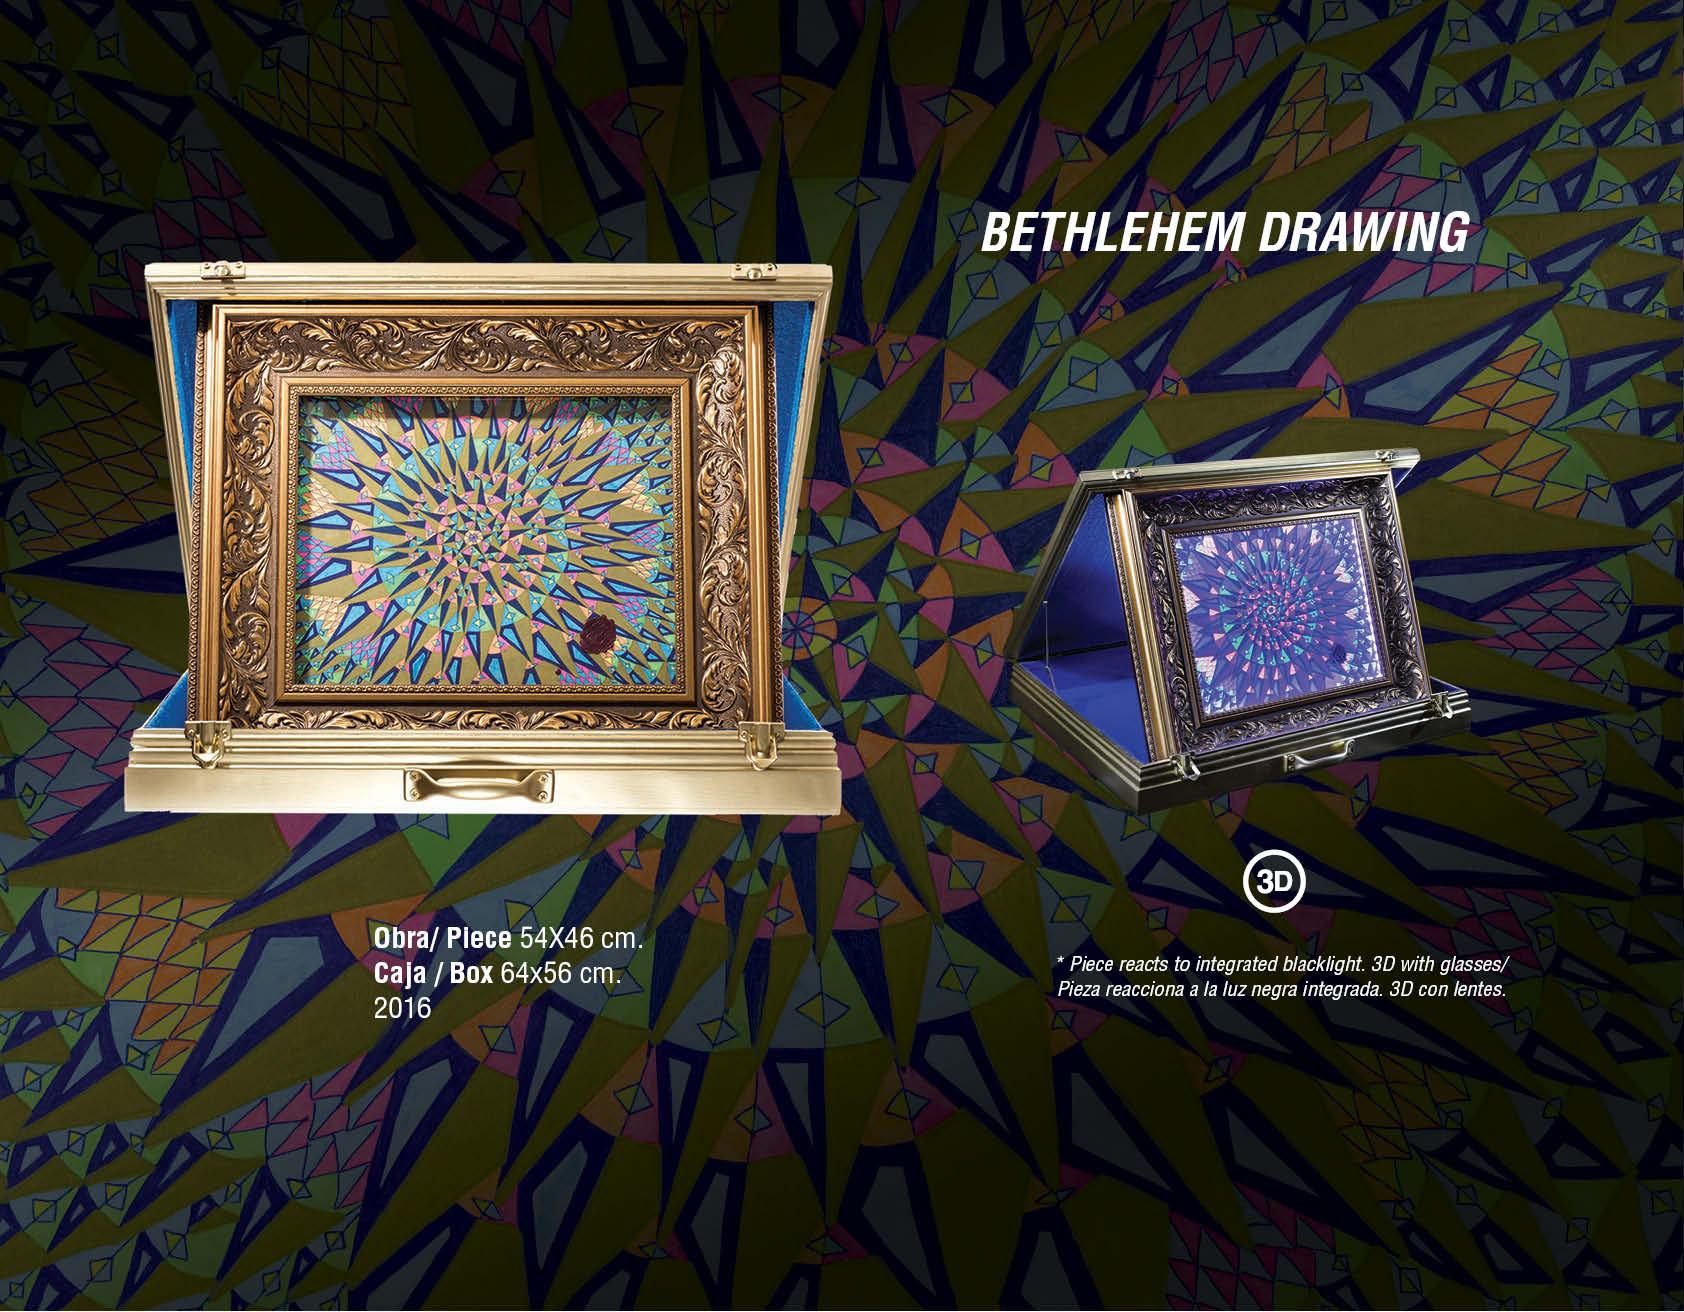 Bethlehem drawing.jpg